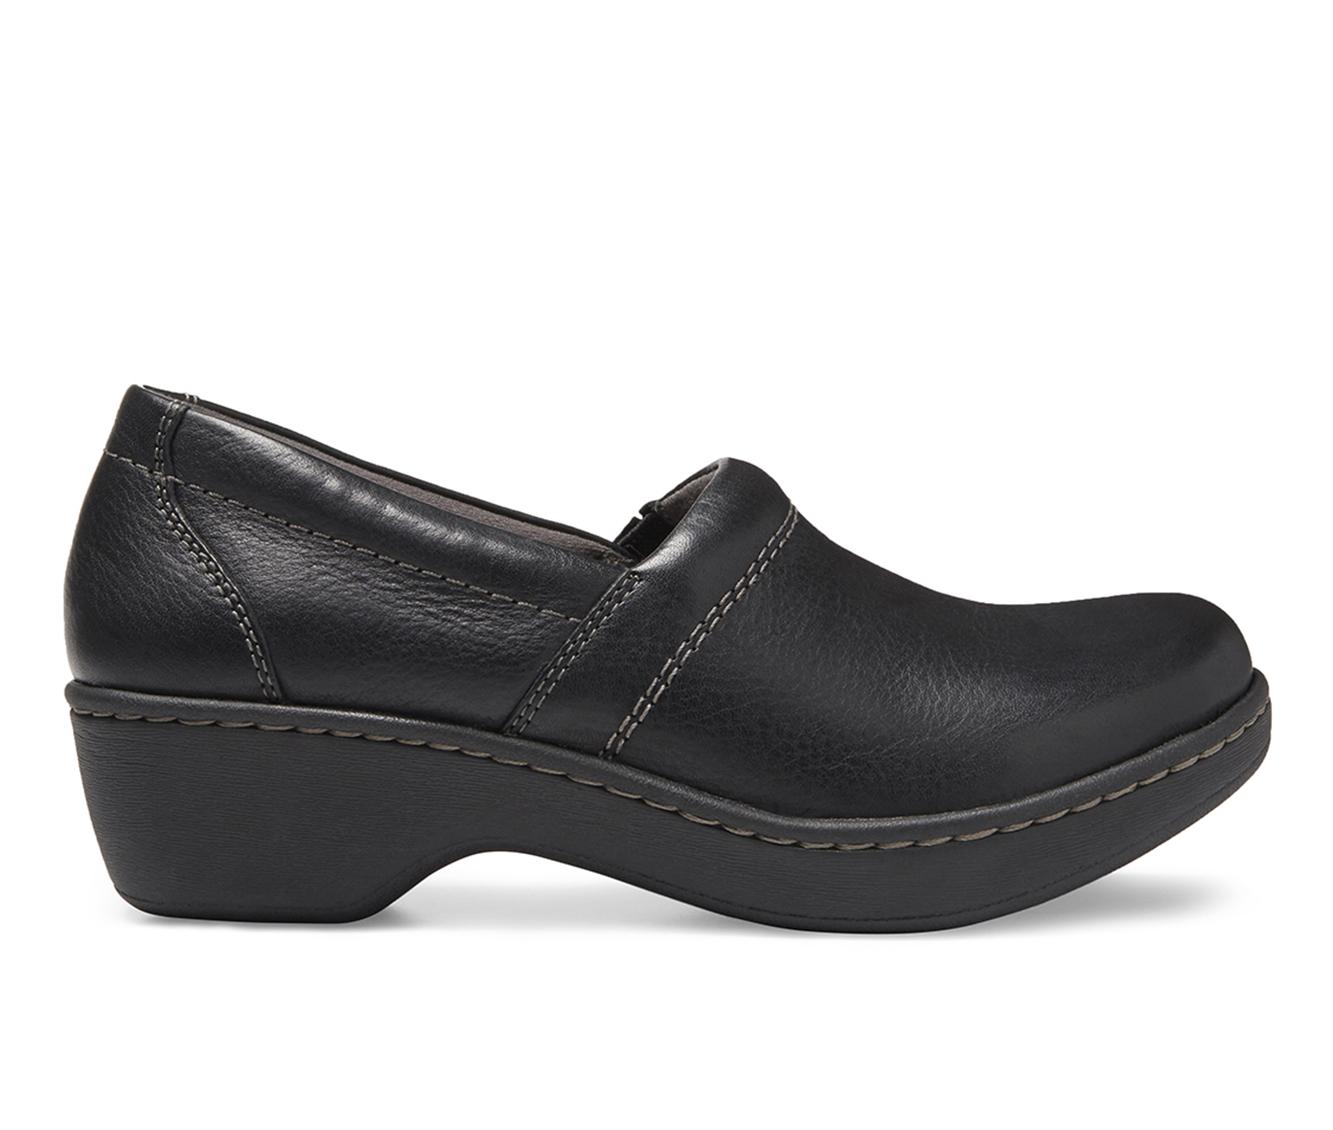 Eastland Constance Women's Shoe (Black Leather)